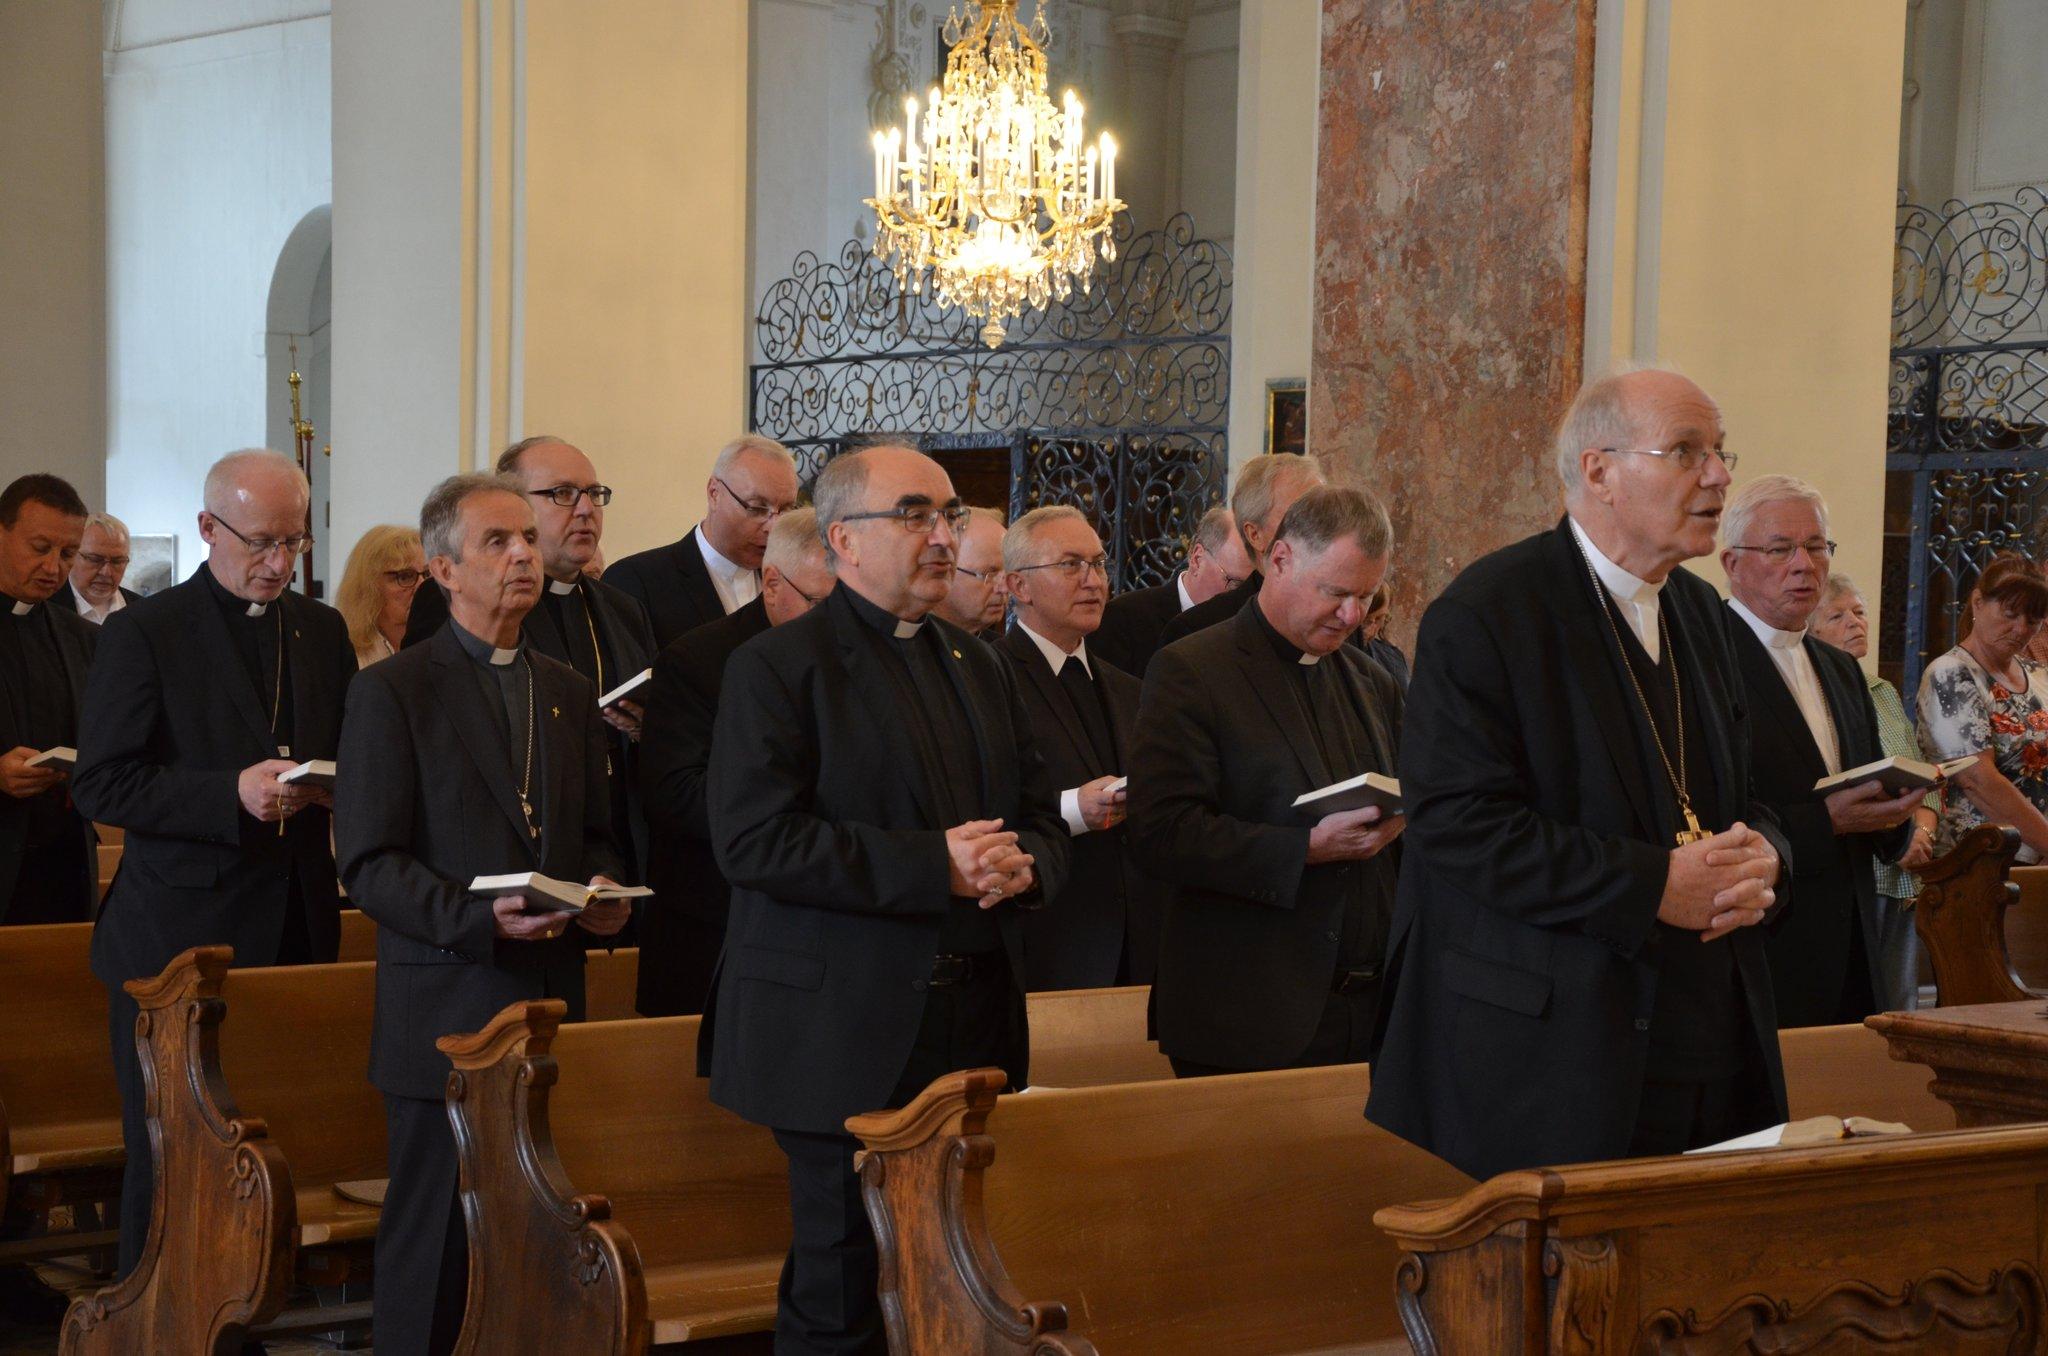 Bischöfe Corona